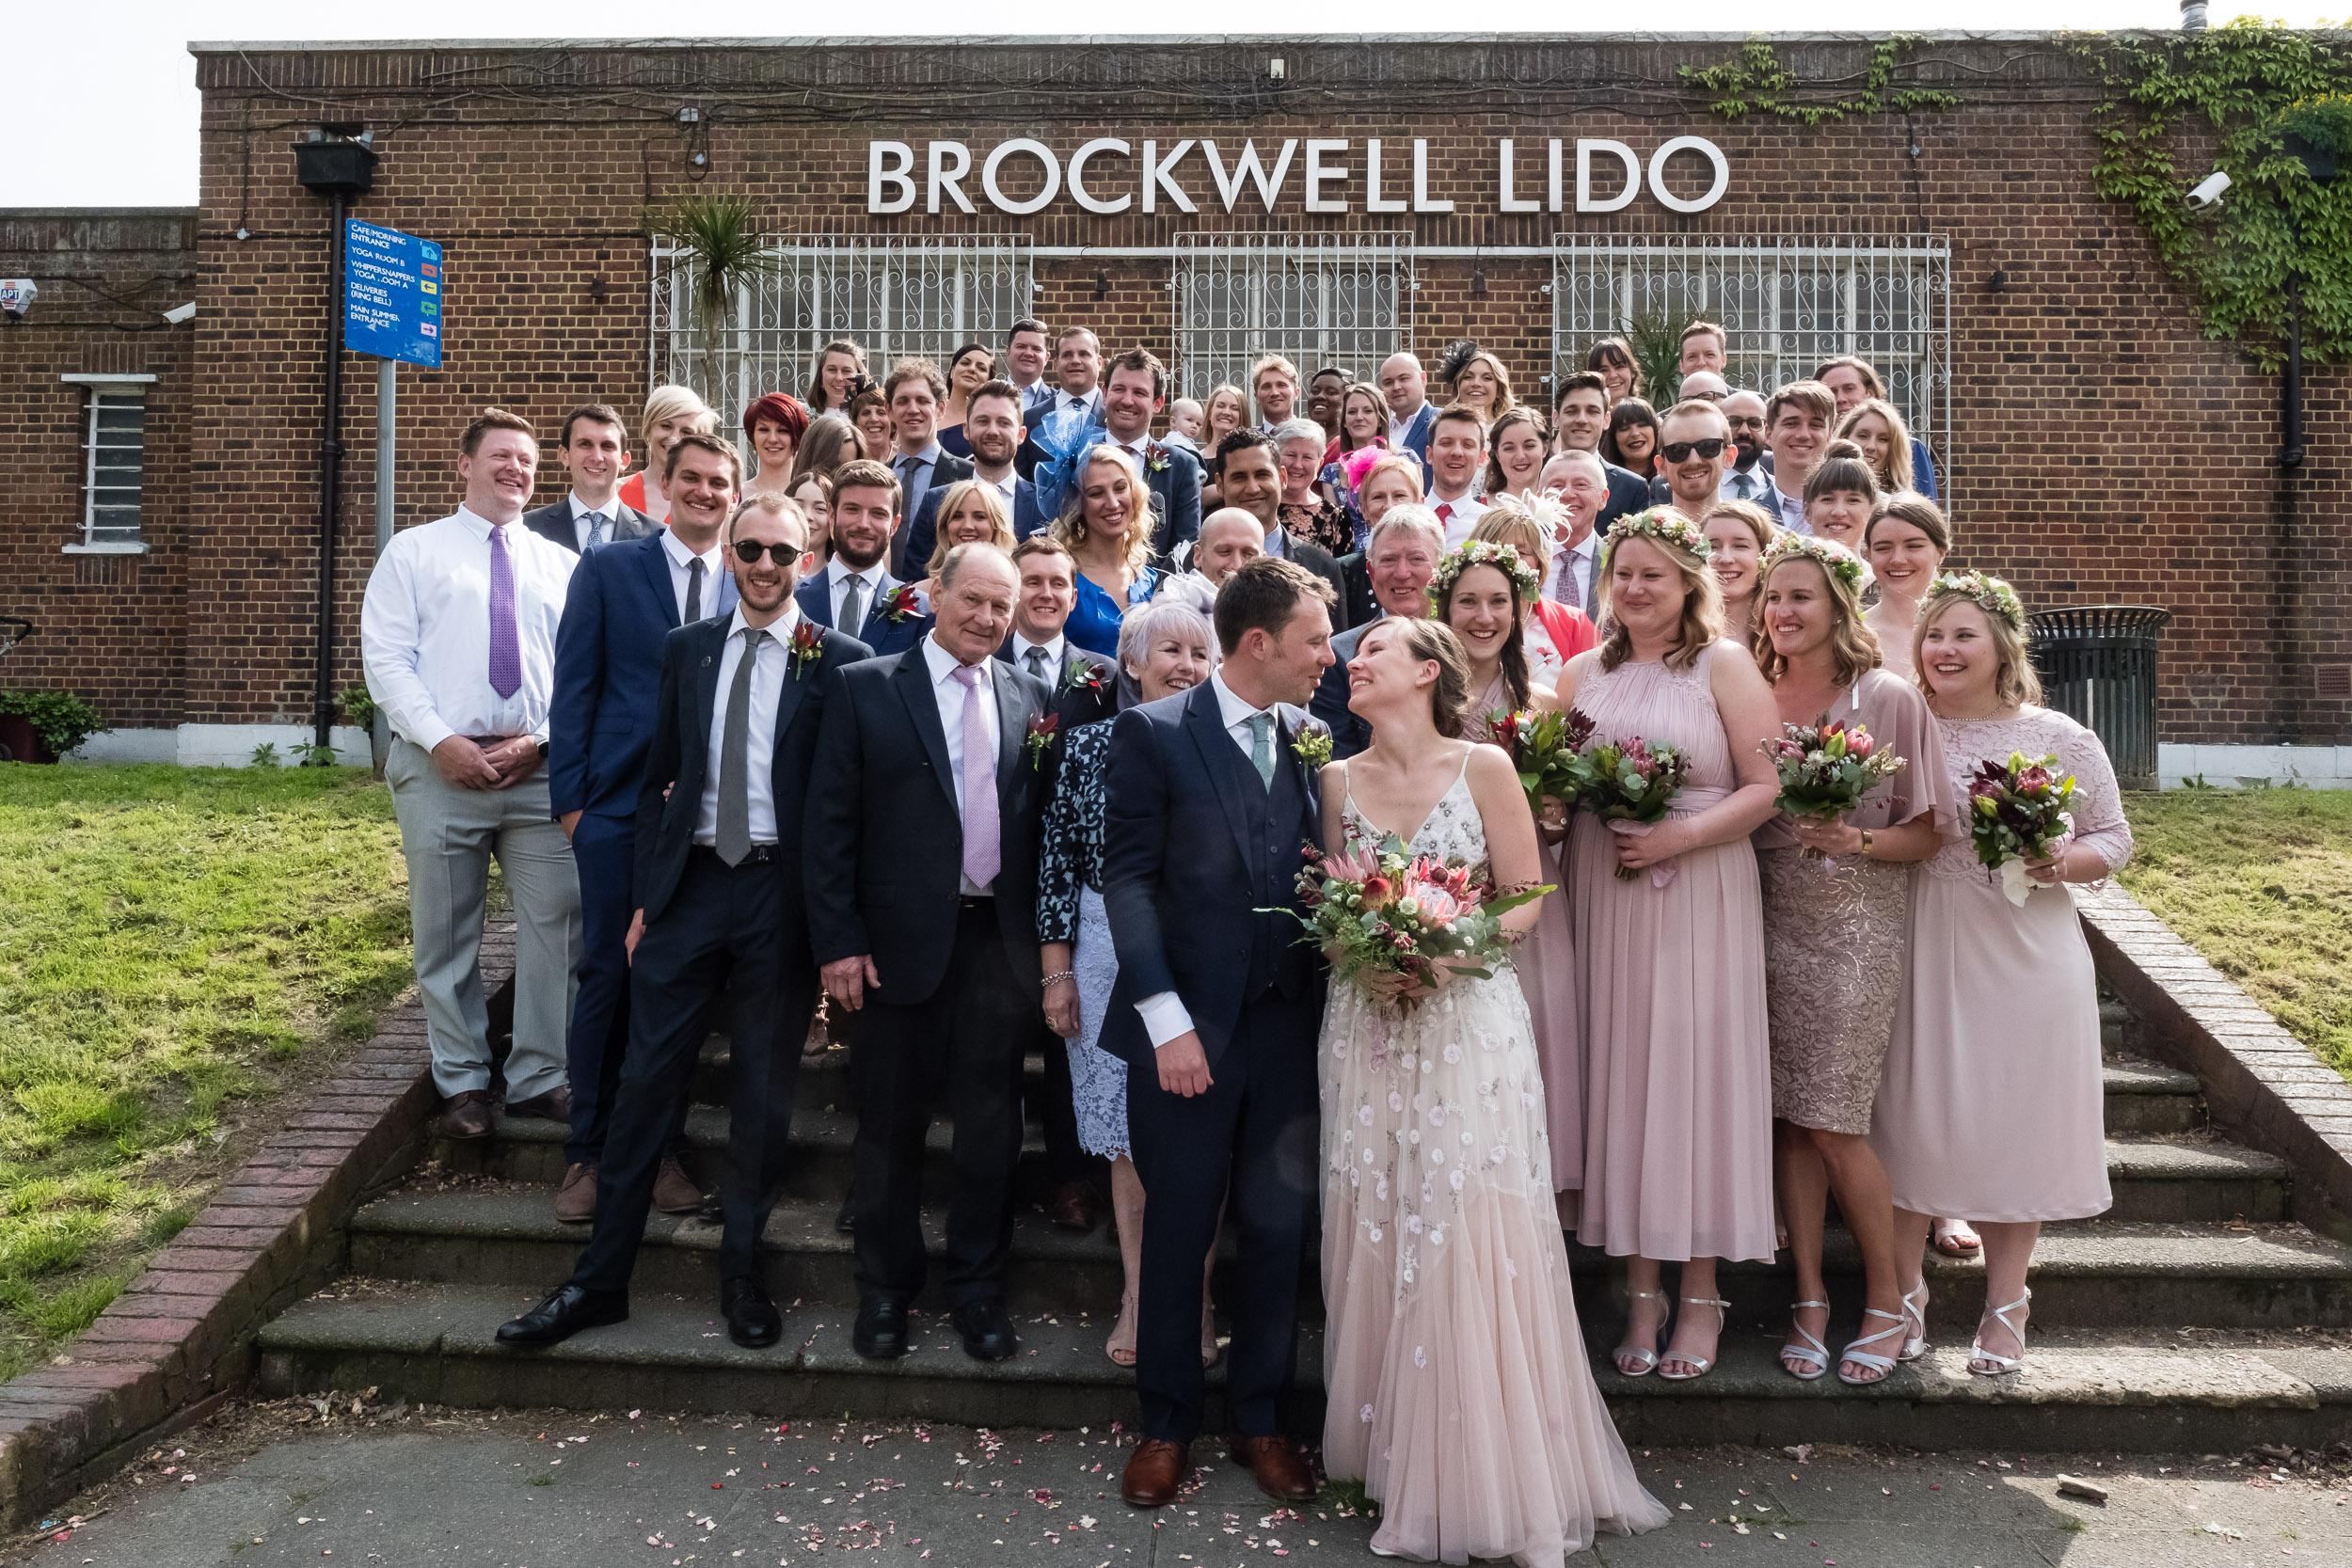 brockwell-lido-brixton-herne-hill-wedding-226.jpg